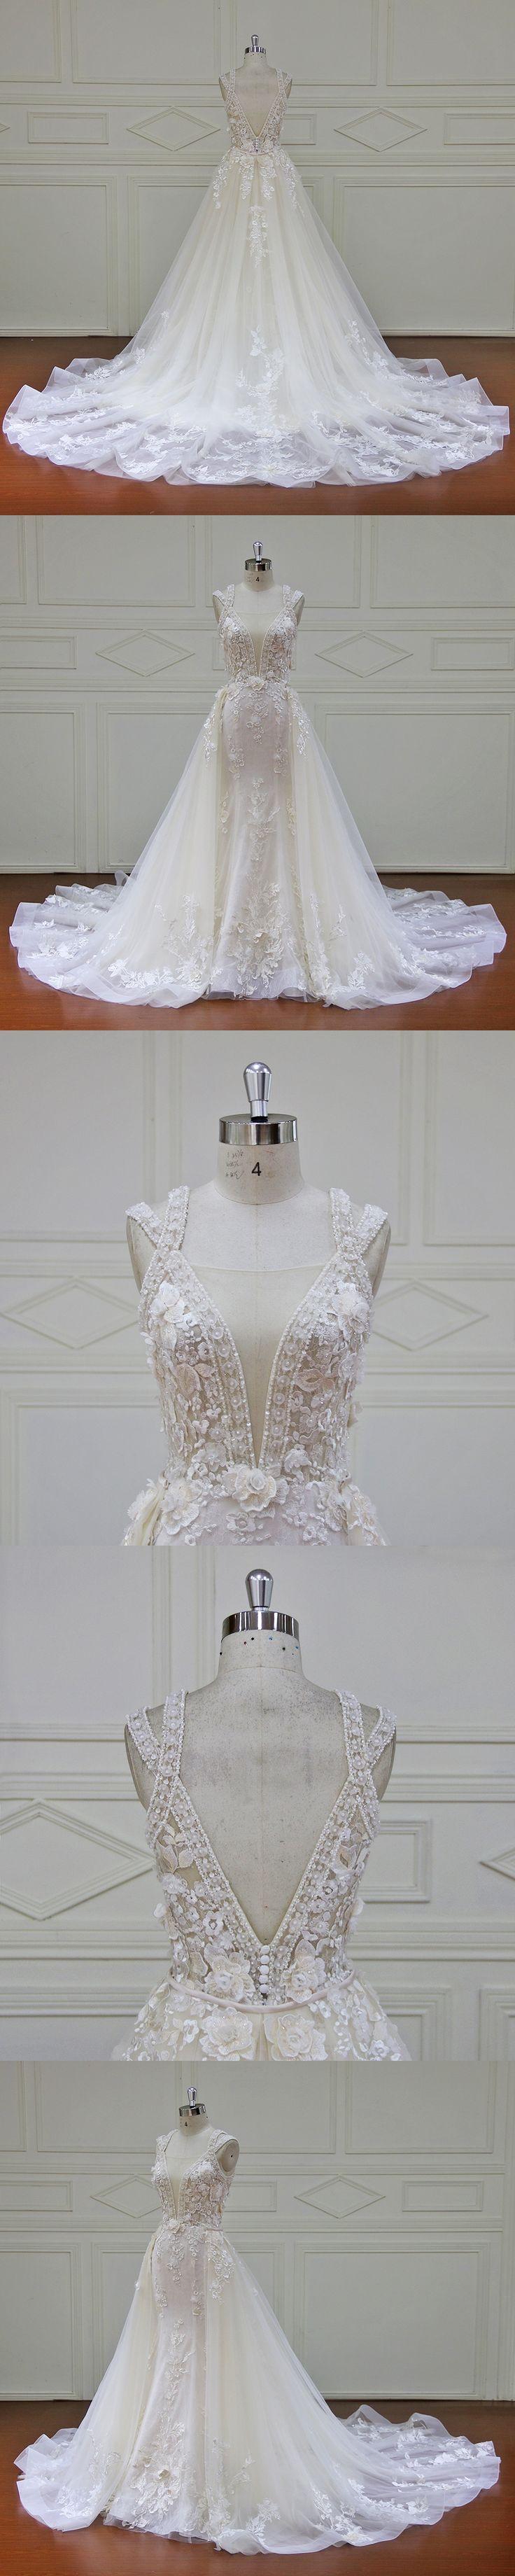 Eslieb Elegant Detachable Train Wedding Dresses Custom made Lace Pearls Sleeveless Wedding Dress 2018 Vestido de Noiva